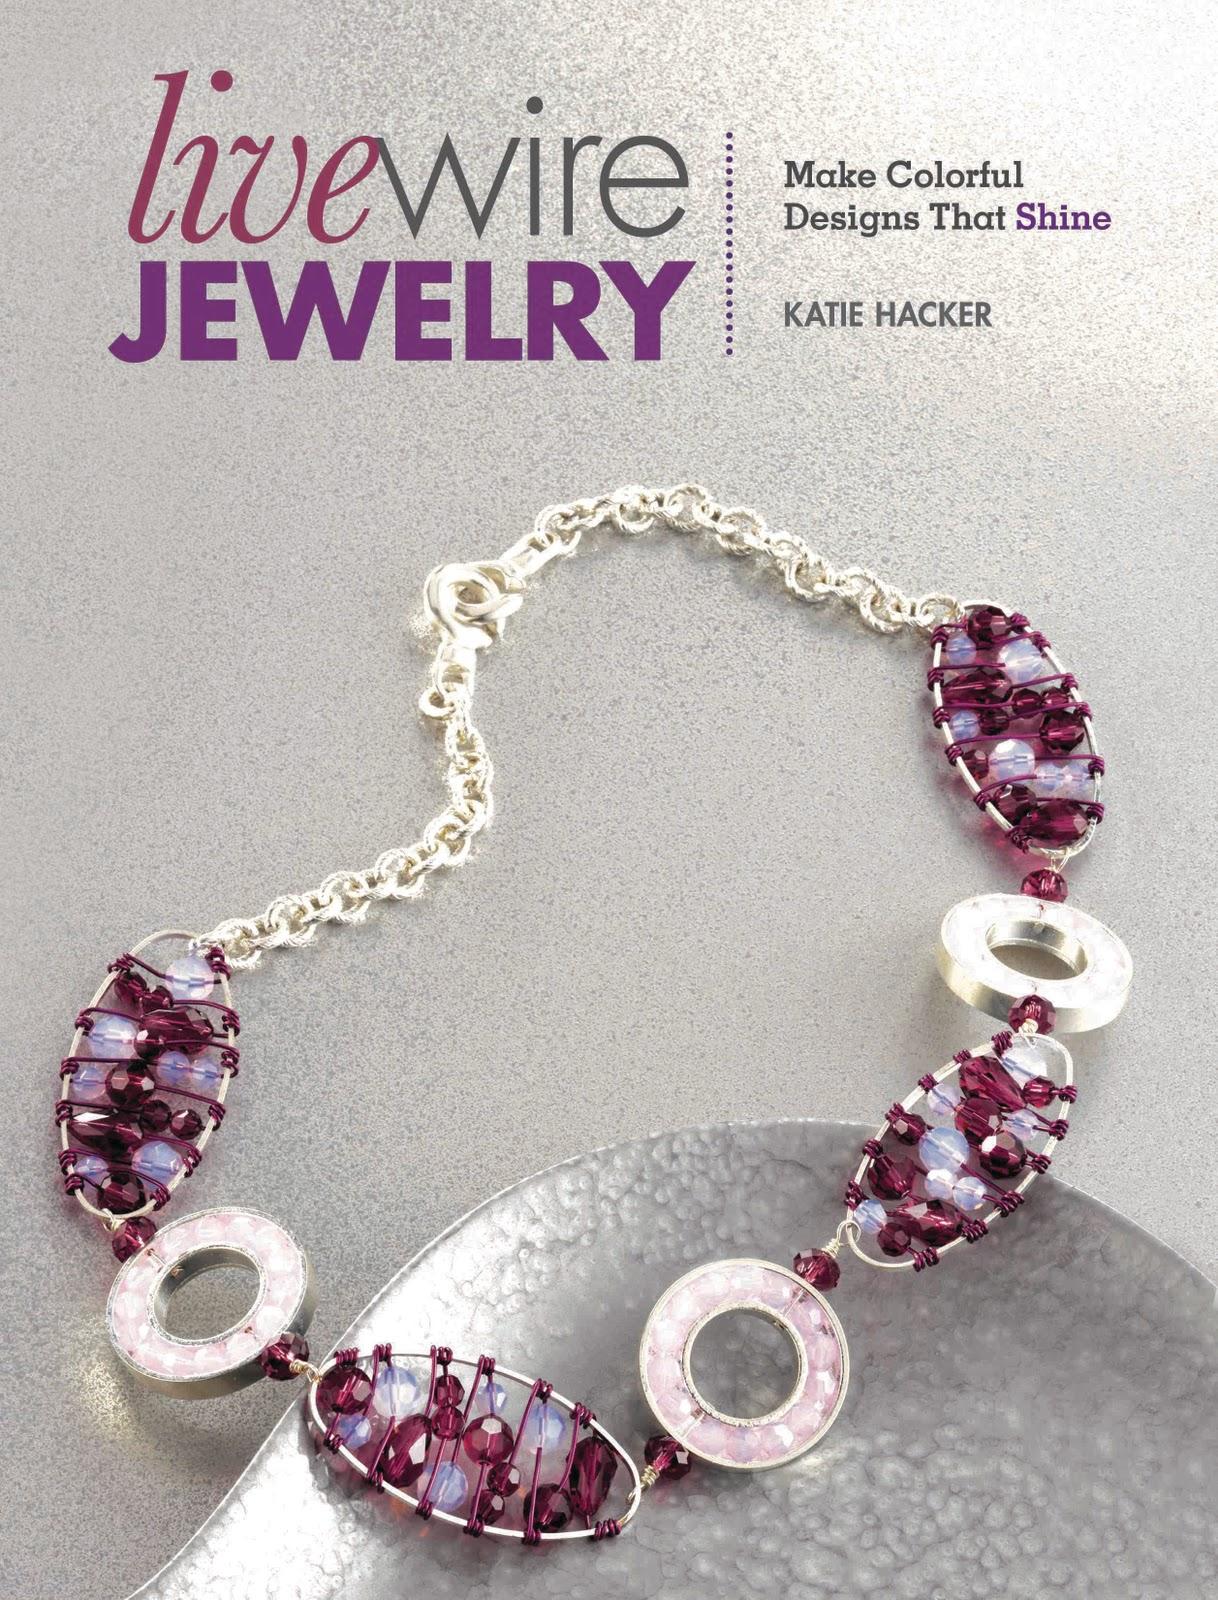 Live Wire Jewelry Katie Hacker